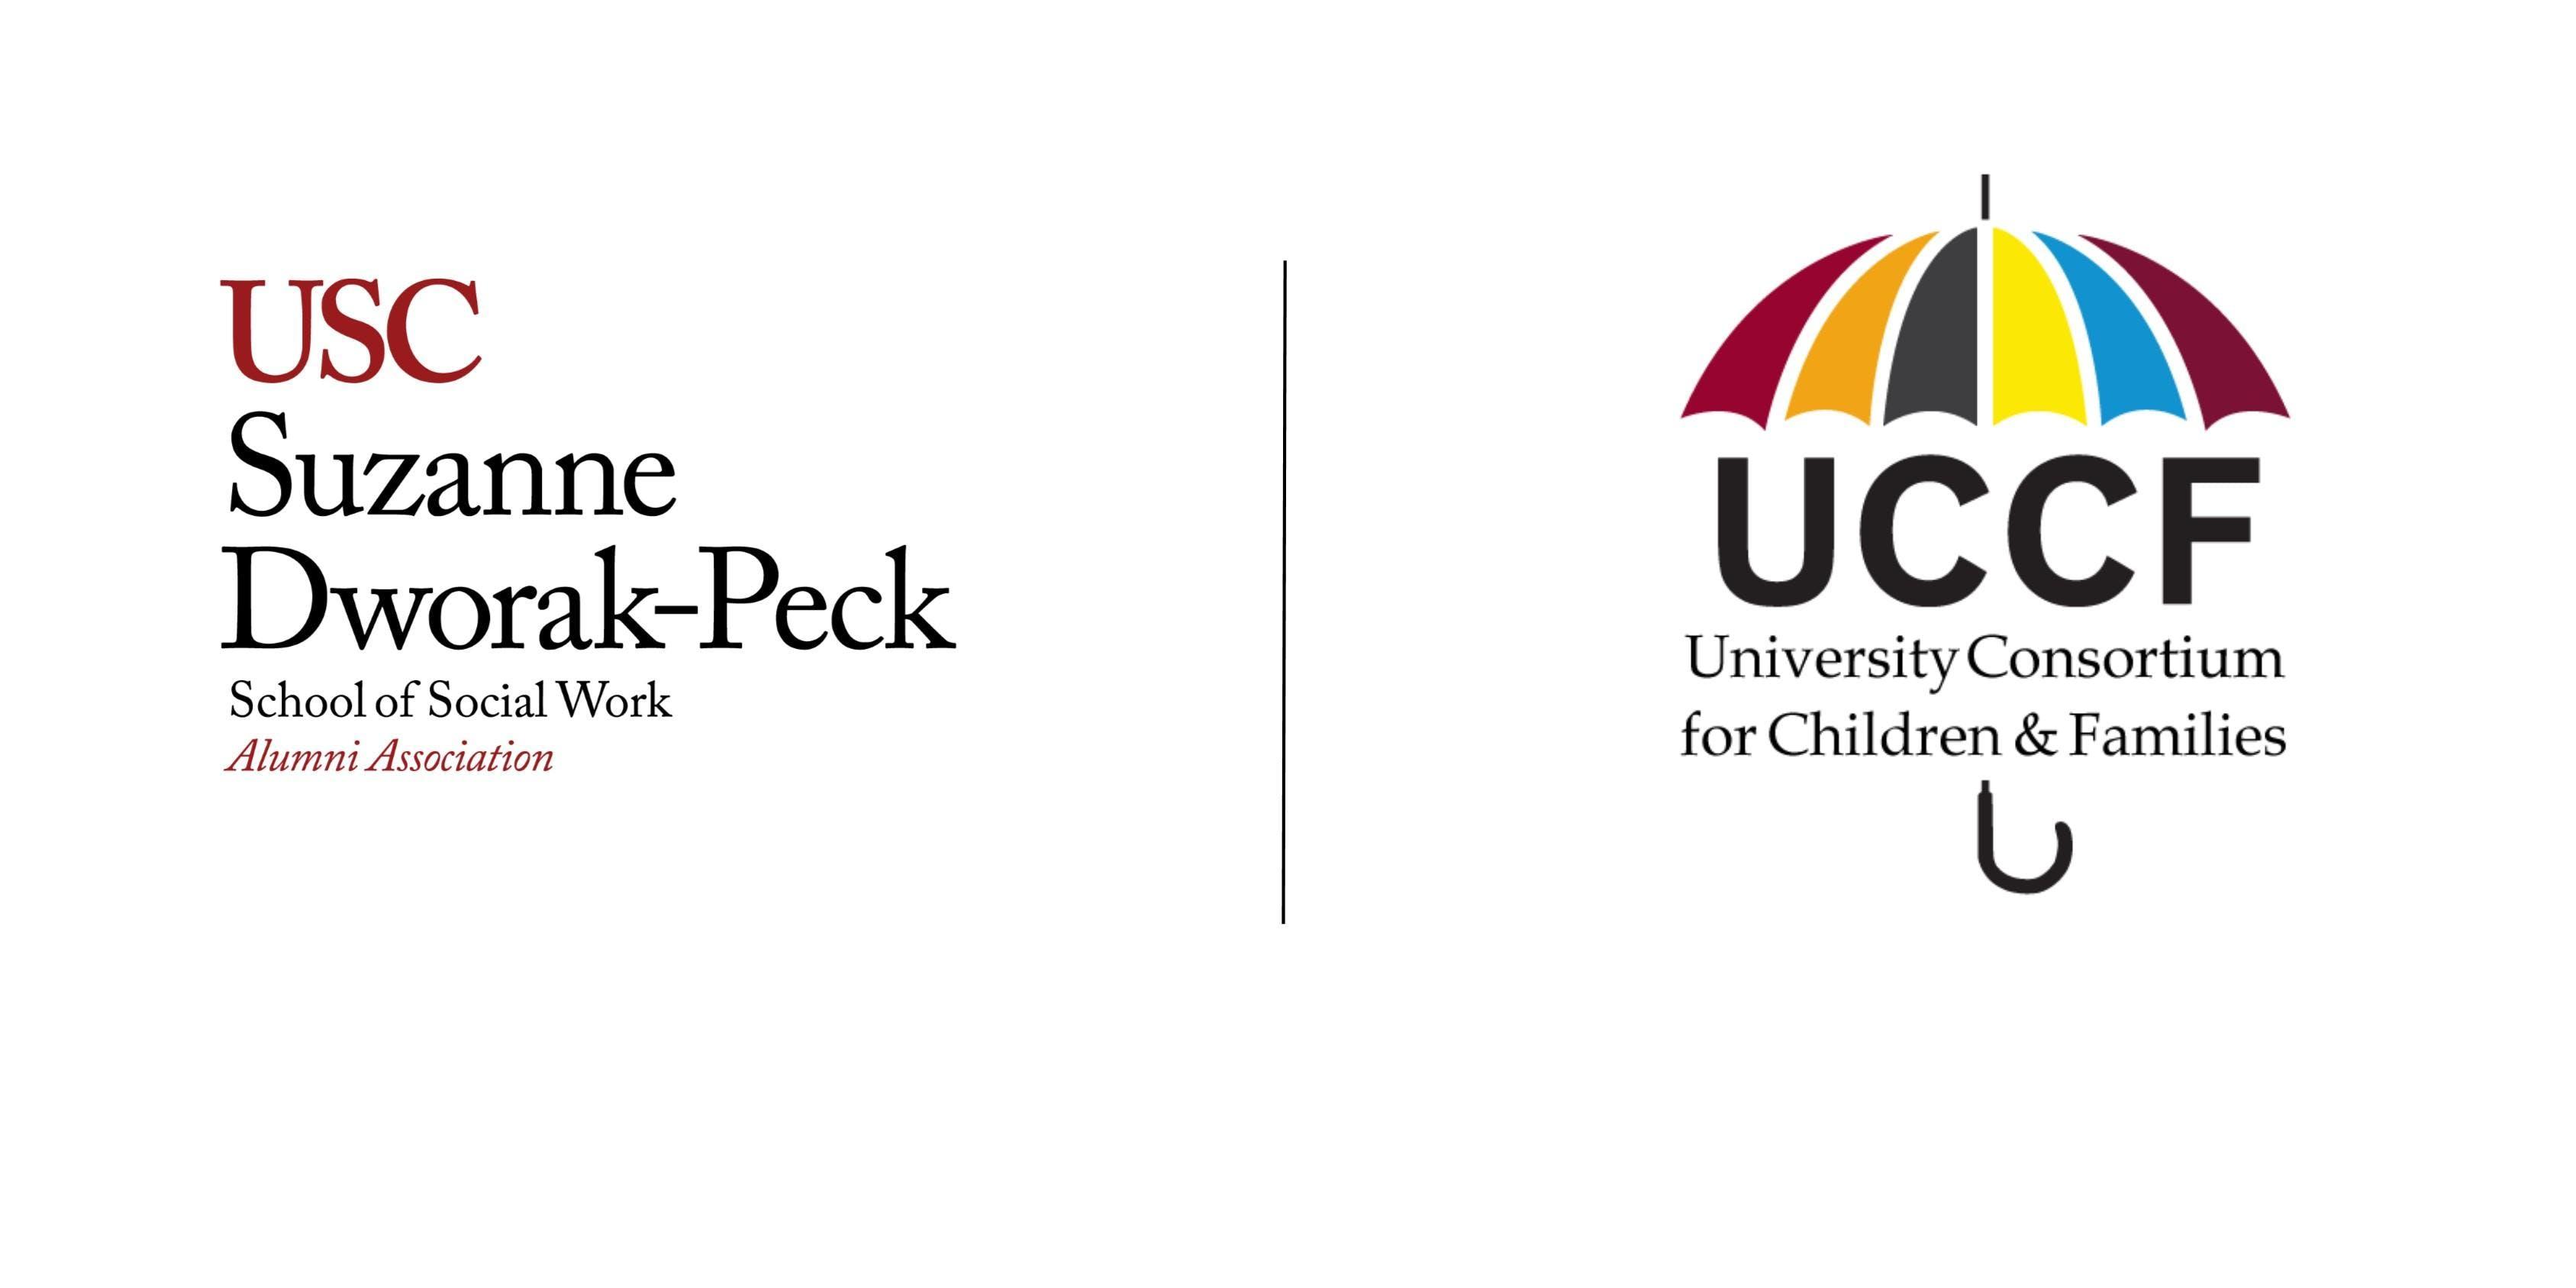 Free California CEUs and Pre-Licensure Courses for USC MSW Alumni